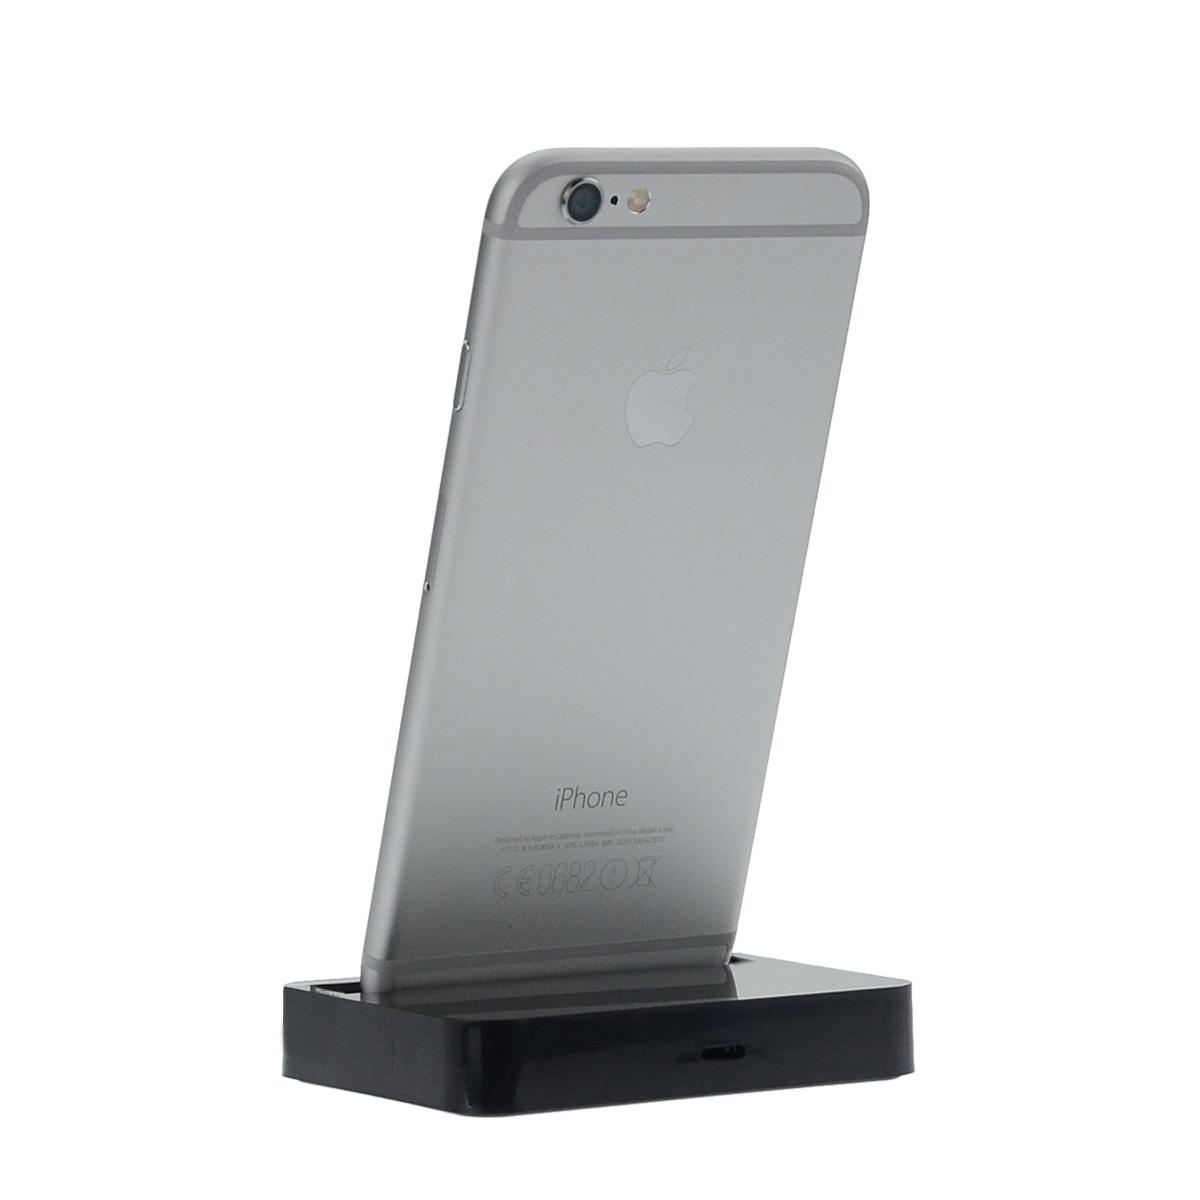 dock station iphone tutte le offerte cascare a fagiolo. Black Bedroom Furniture Sets. Home Design Ideas